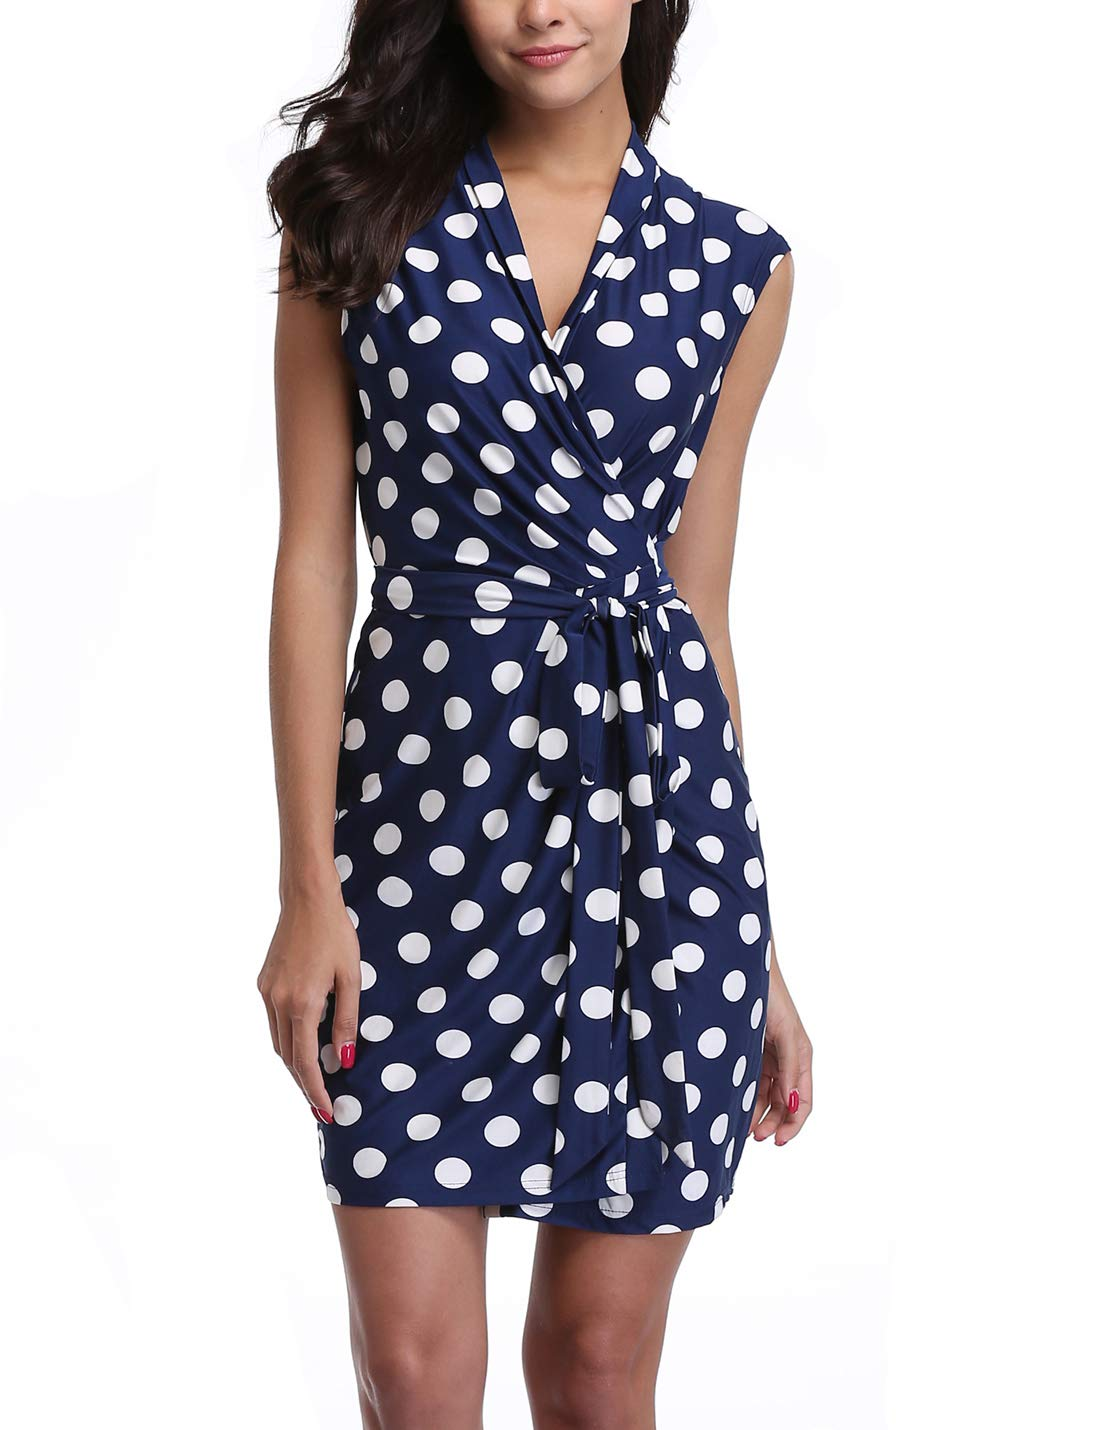 MISS MOLY Women's Knee Length V Neck Sleeveless Tie Waist Polka Dots Casual Romper Jumpsuit Wrap Dress (6 Small, White-Blue)